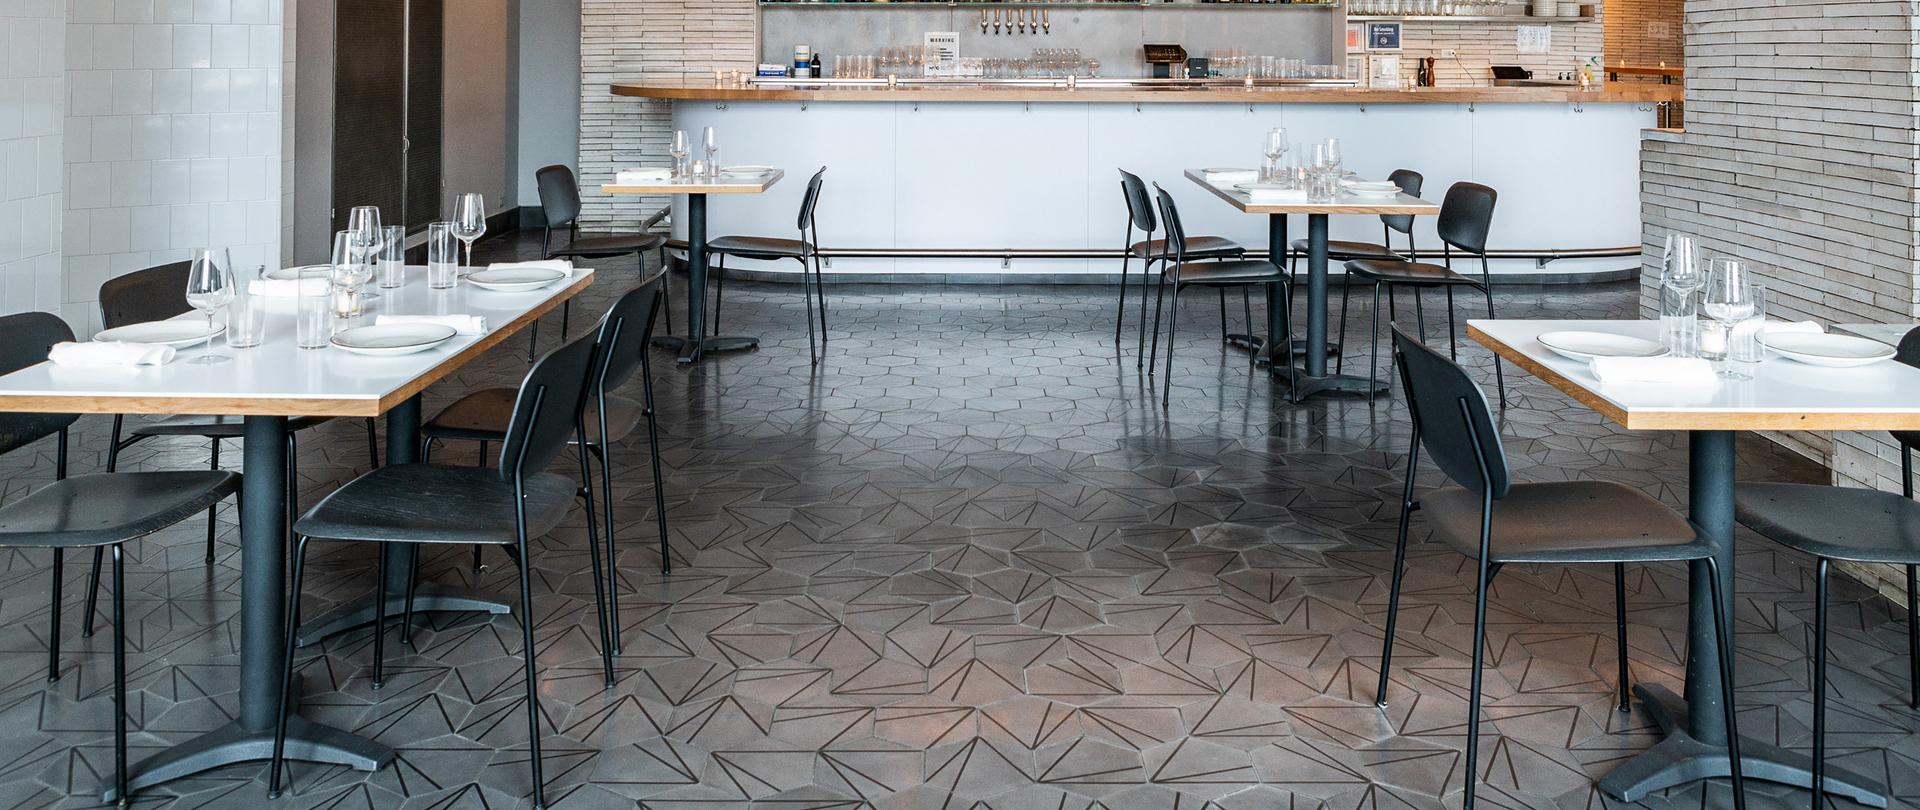 Crow's Feet Seagull Cement Tile, by Villa Lagoon Tile.